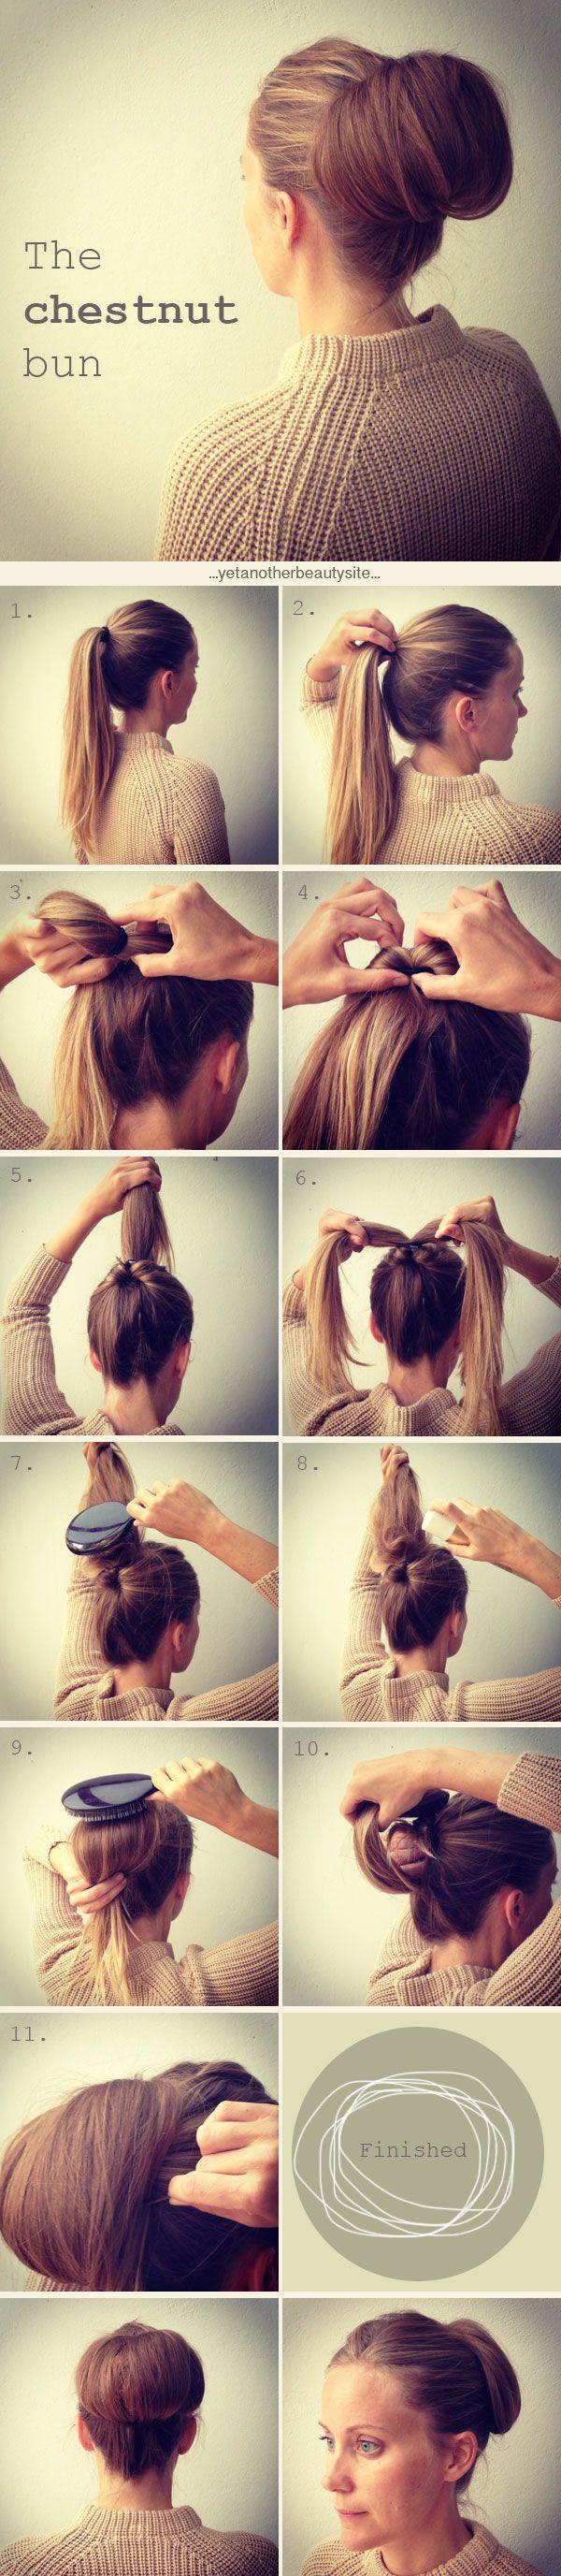 Yet another beauty site #hair #hairtutorial #chestnutbun